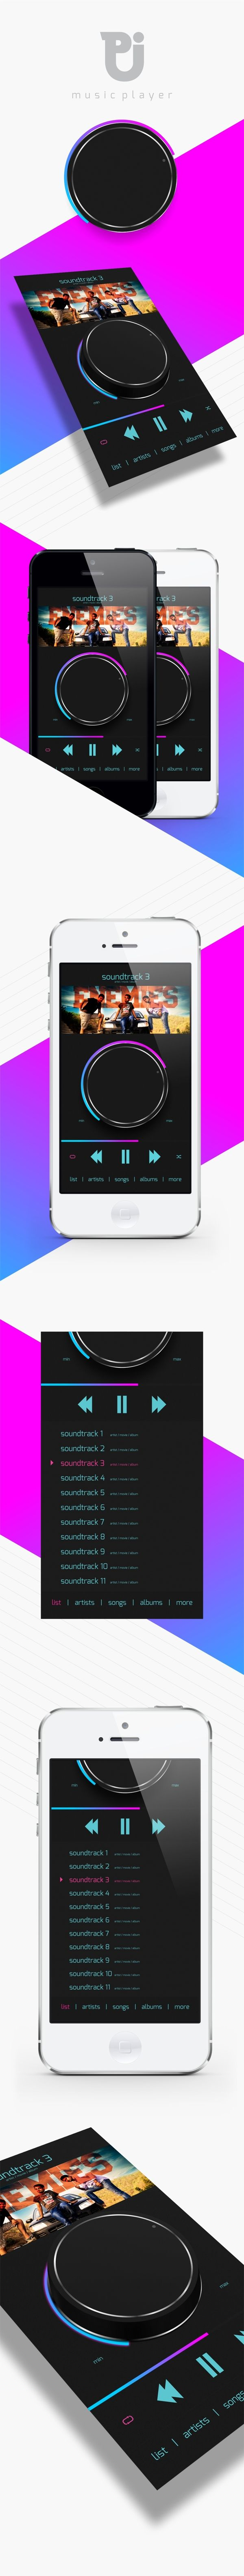 CONCEPT - iOS MUSIC PLAYER by Pintu Dhiman, via Behance *** #app #iphone #ios #gui #ui #player #behance